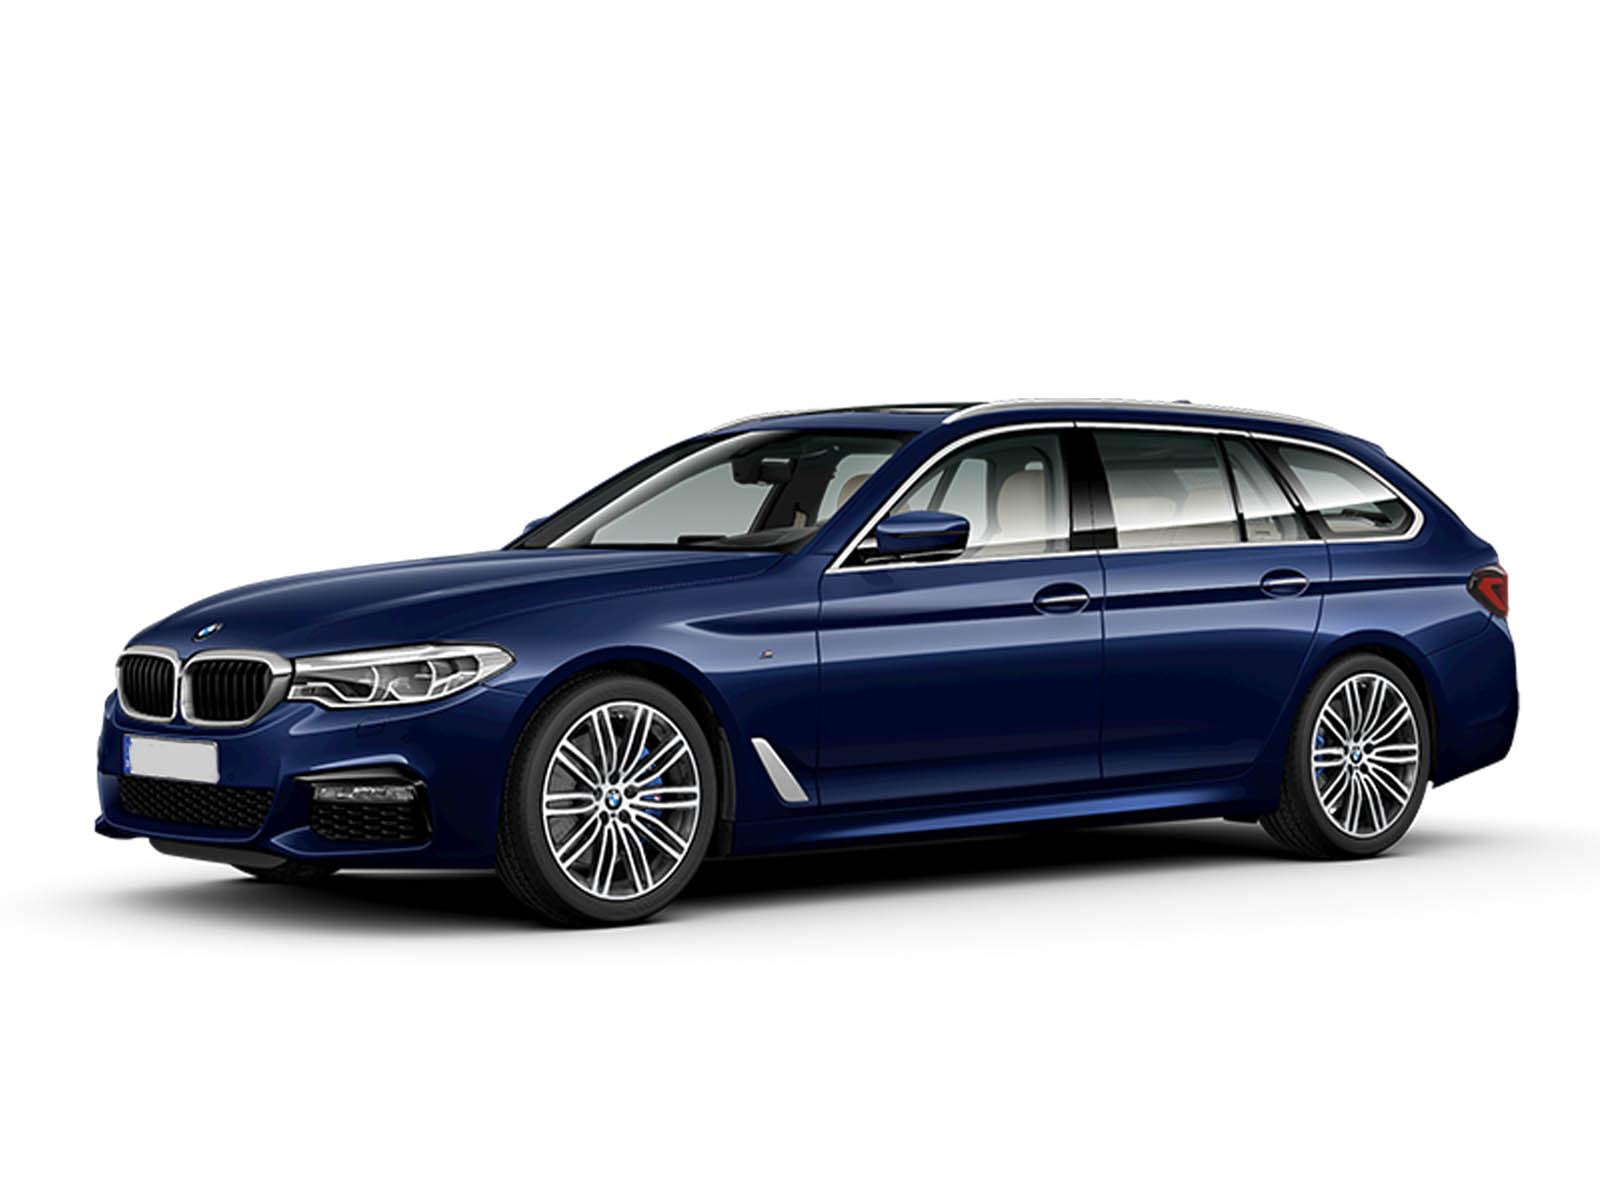 BMW 5-Serie Touring 520i Corporate Executive Automaat 5d.